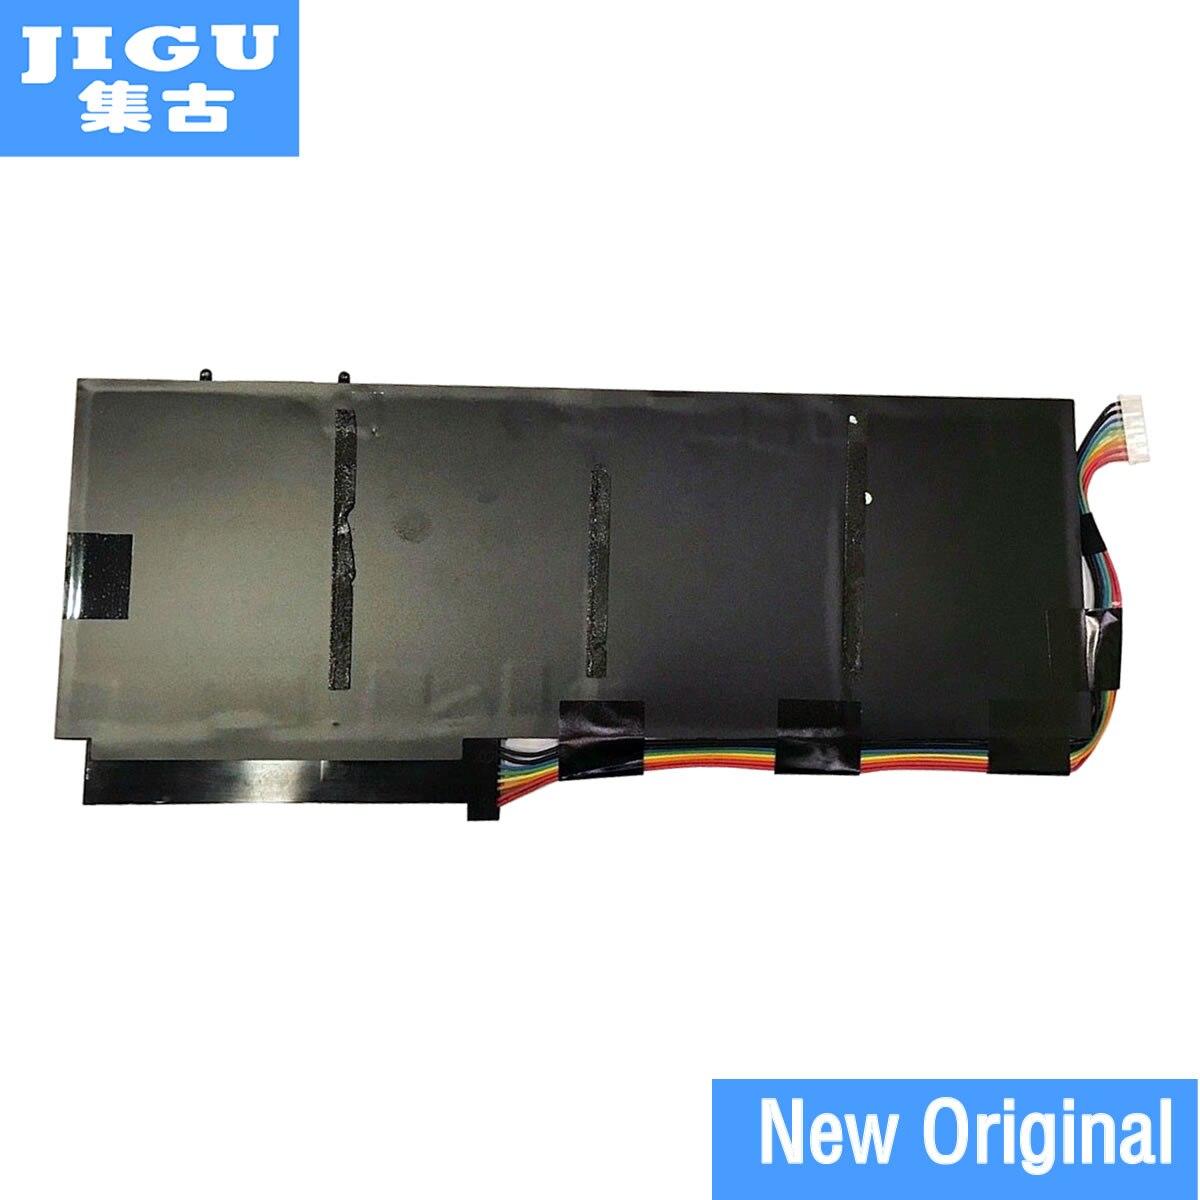 Оригинальный аккумулятор JIGU 2ICP5/60/80-2 AC13A3L для ACER Aspire P3-131 для TravelMate X313 7,6 V 40WH